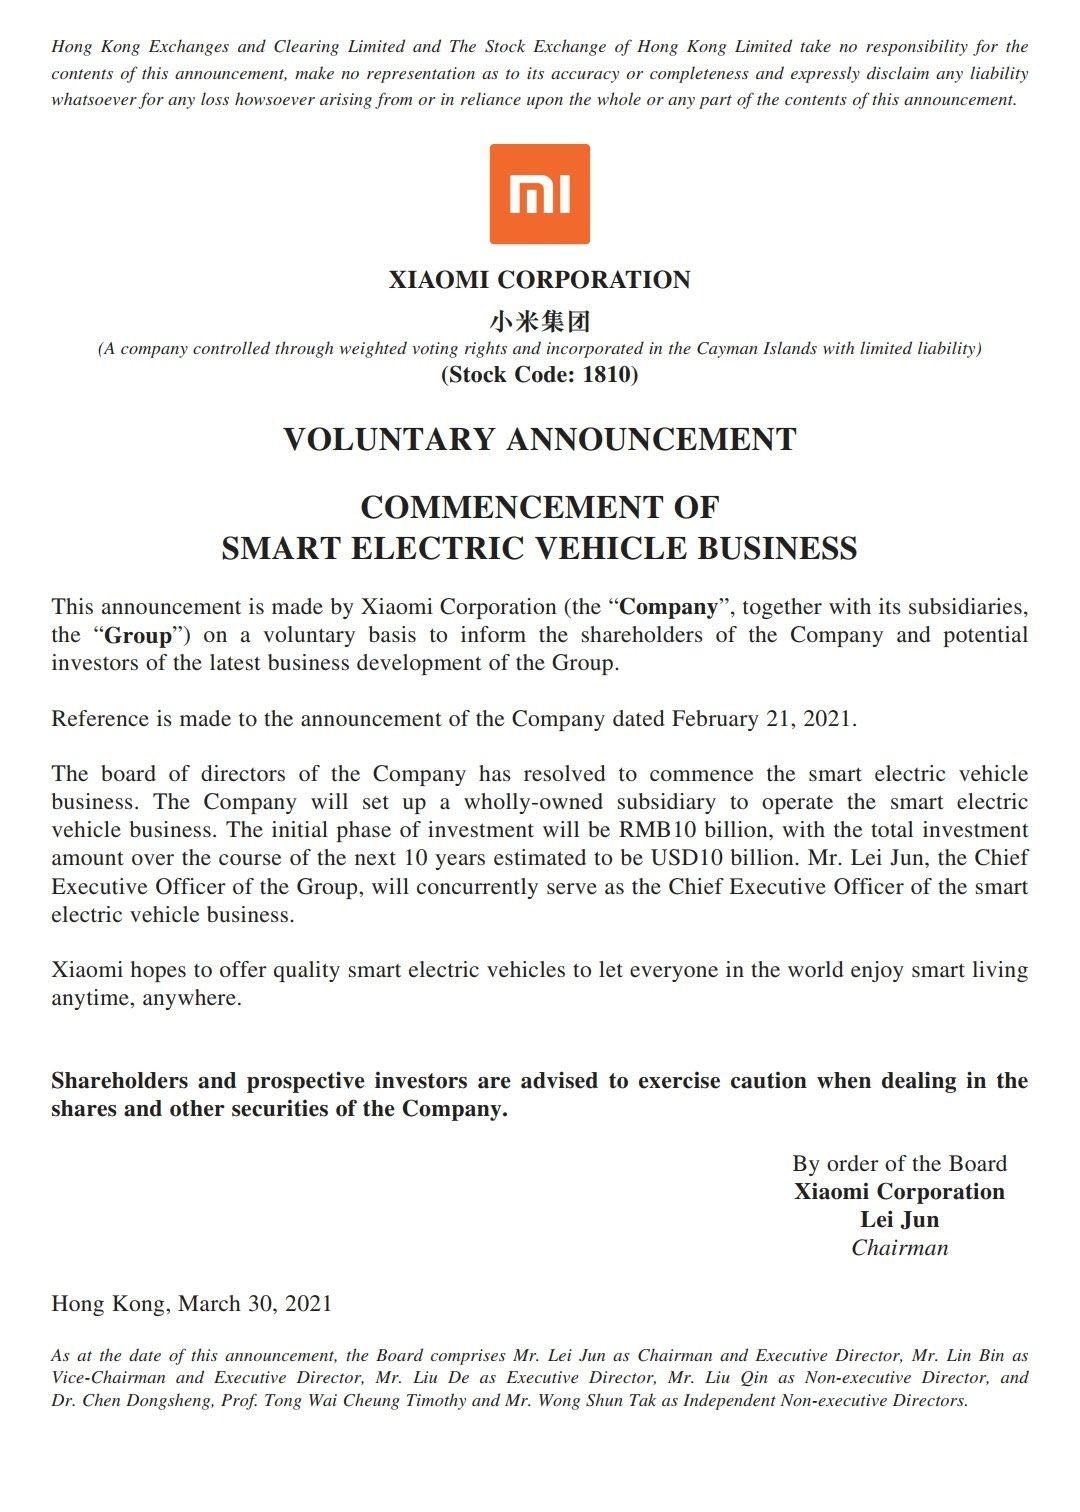 Xiaomi Ventures into electric car business